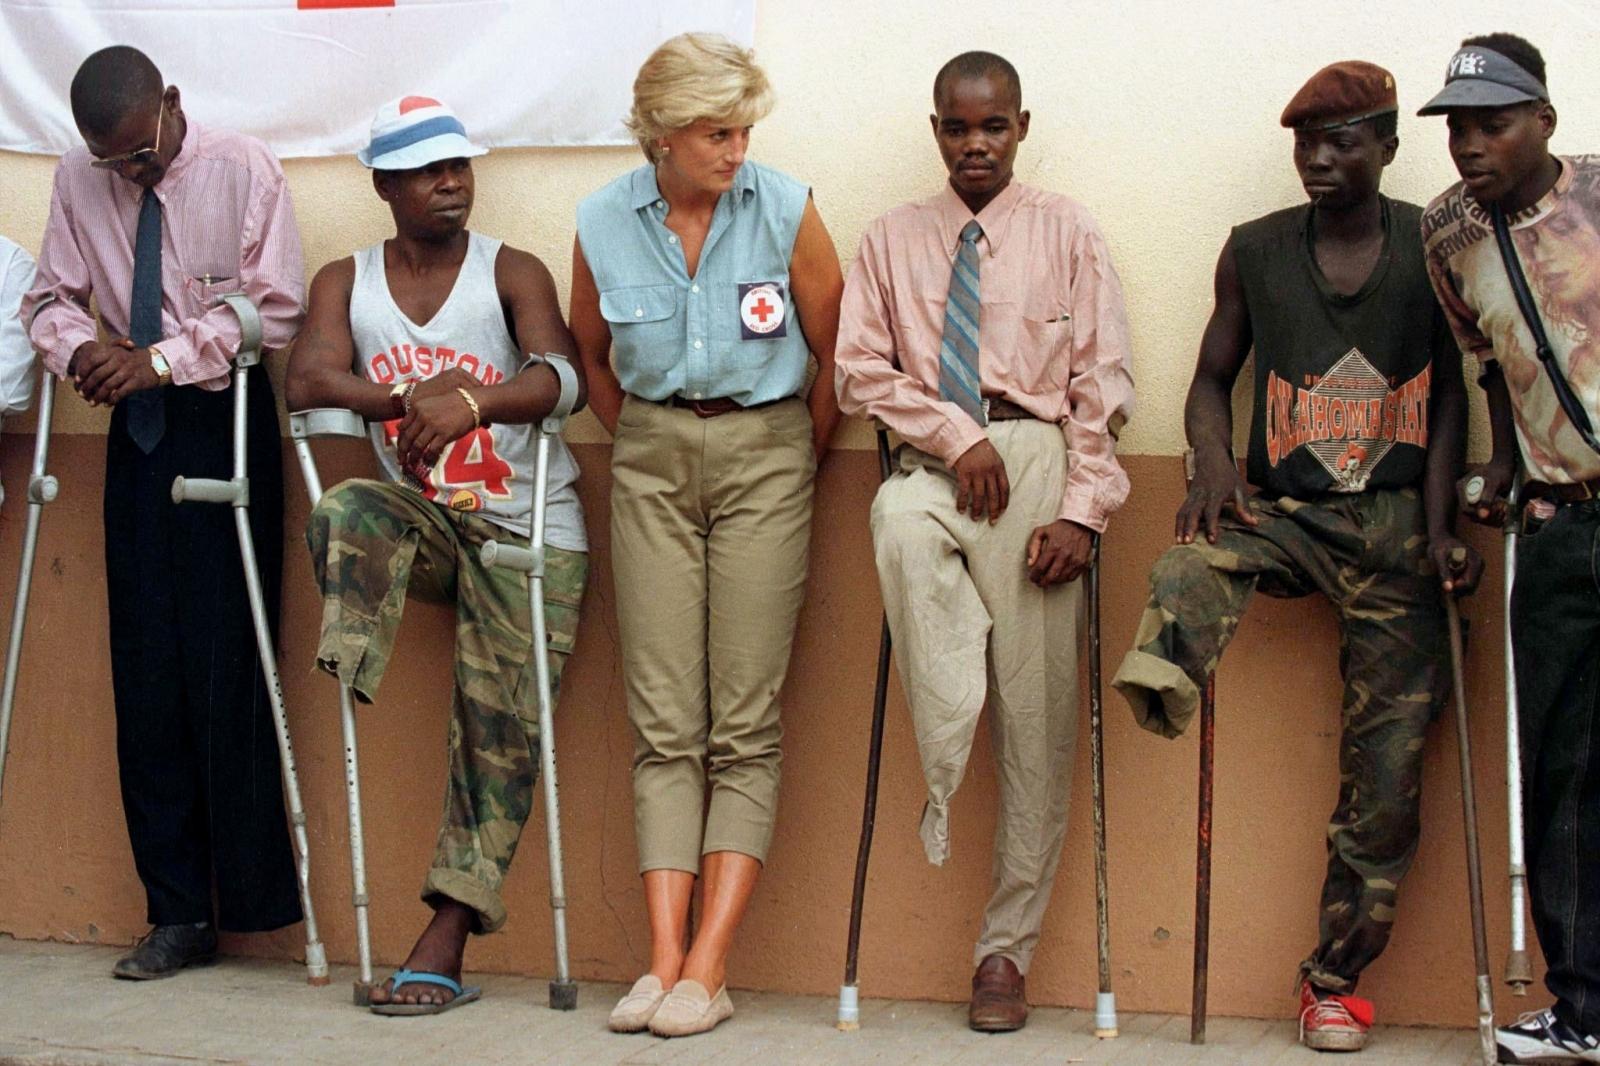 Princess Diana landmine victims